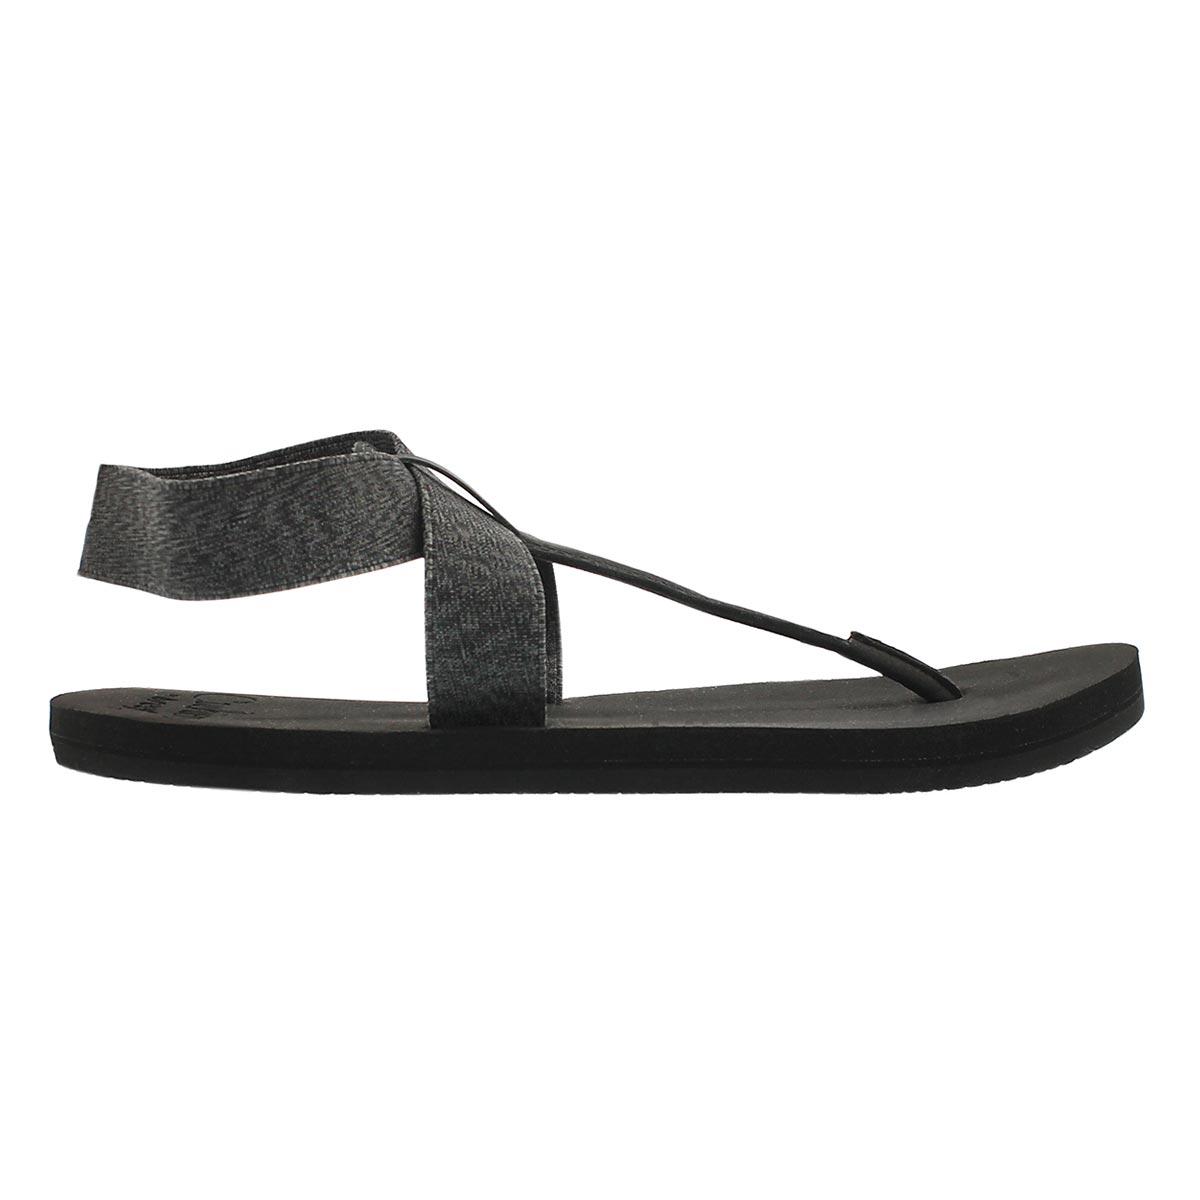 Lds Cushion Moon black thong sandal